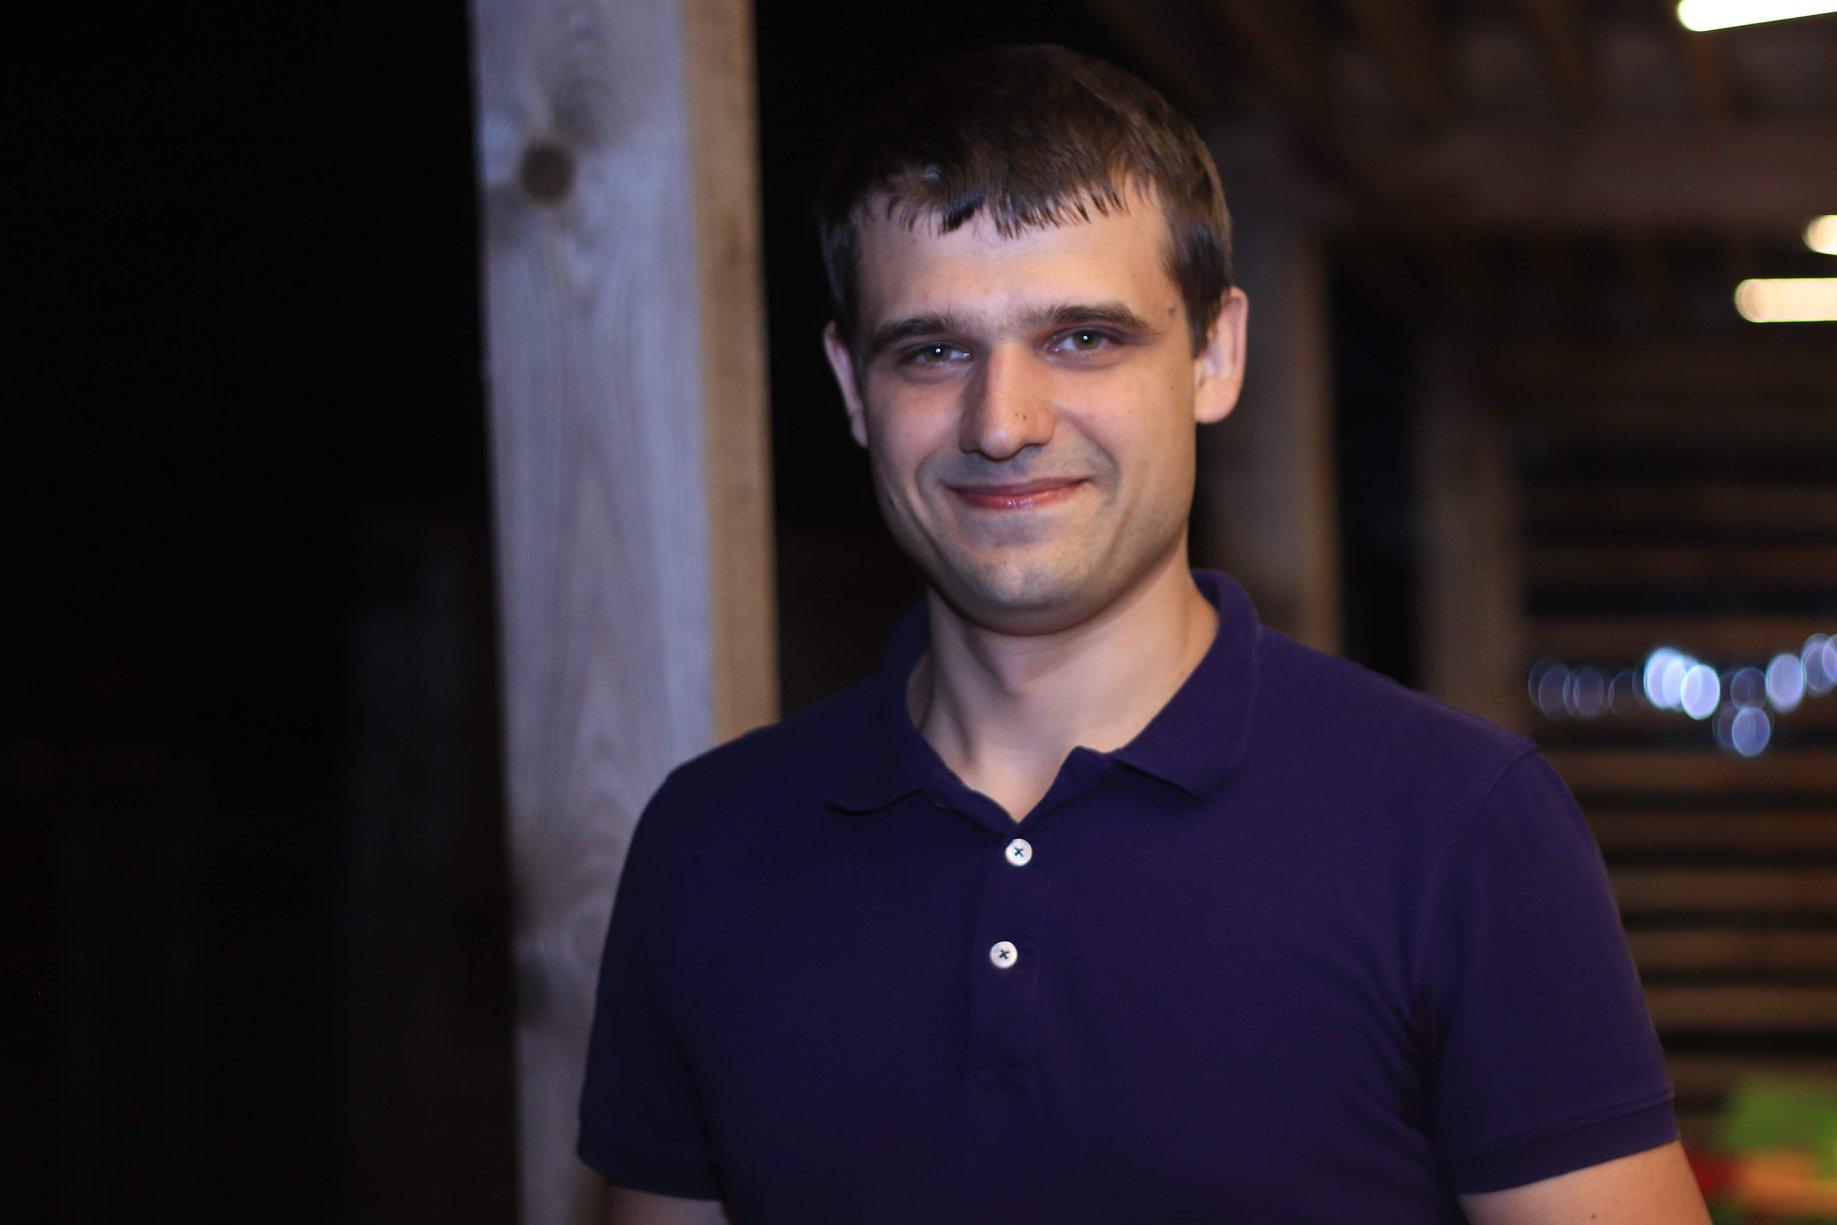 Сорокун Антон Дмитрович